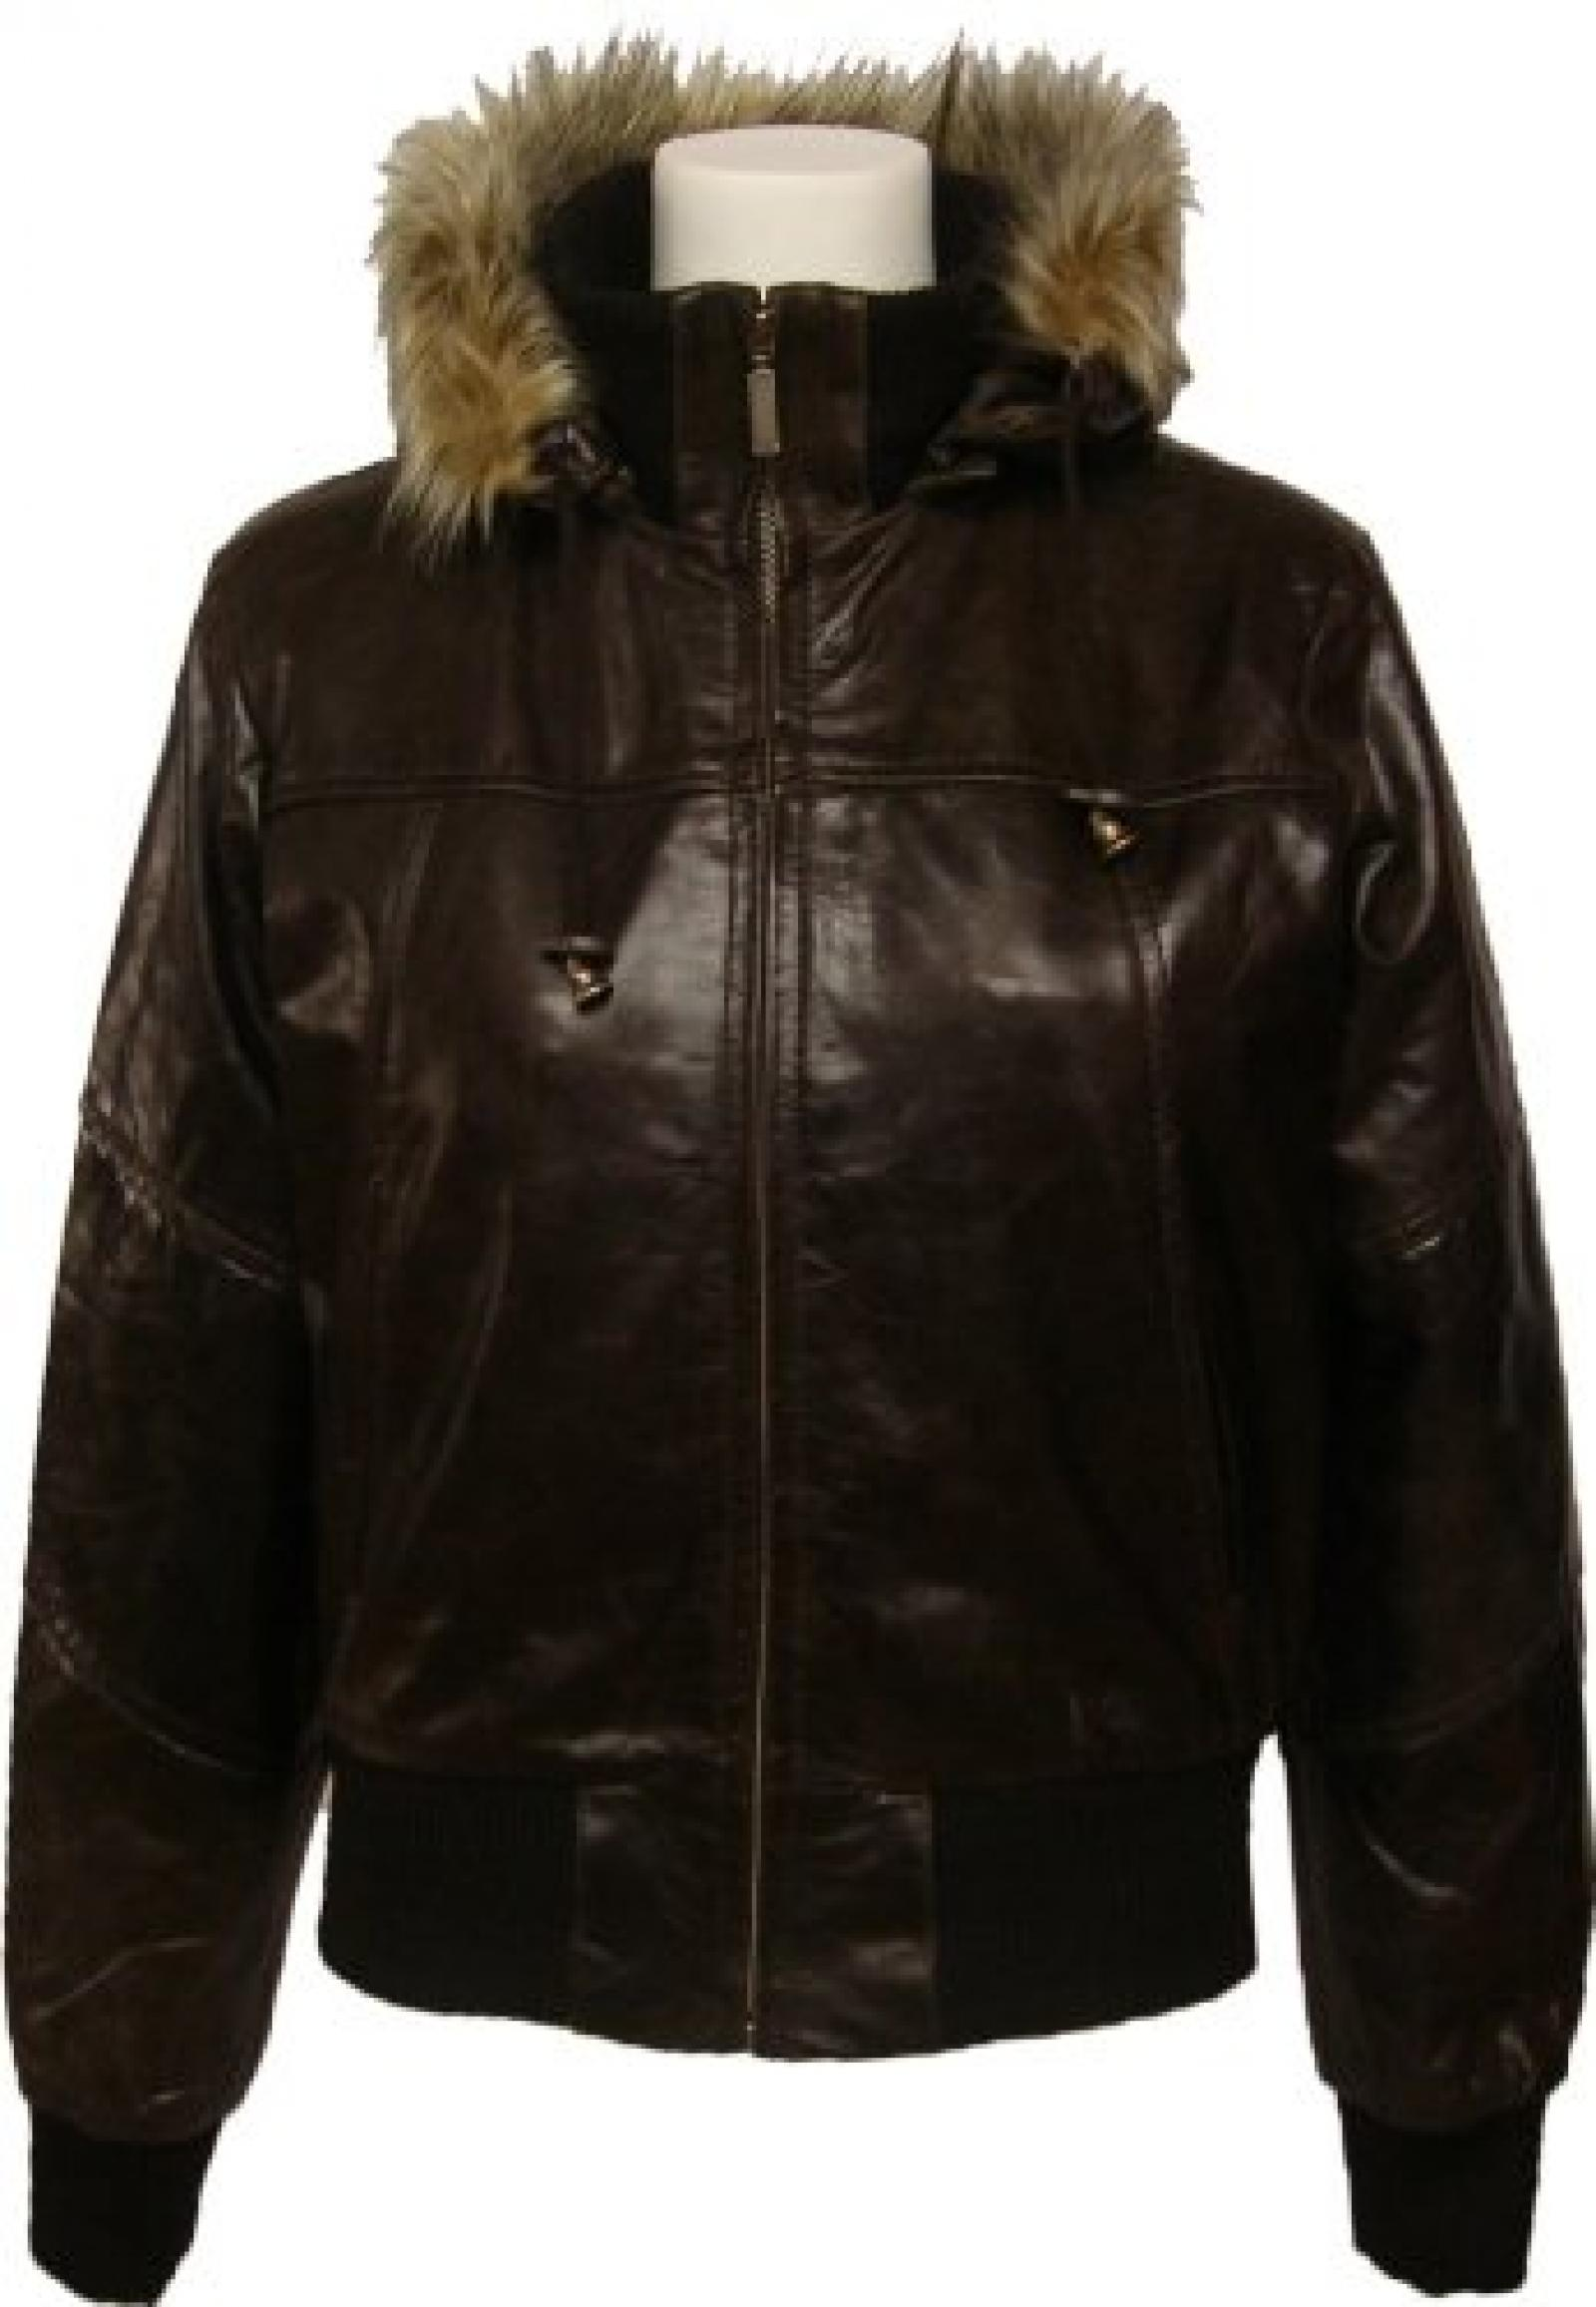 UNICORN Frauen Echt Leder Jacke Bomber Mit Fell Kragen Braun #M2